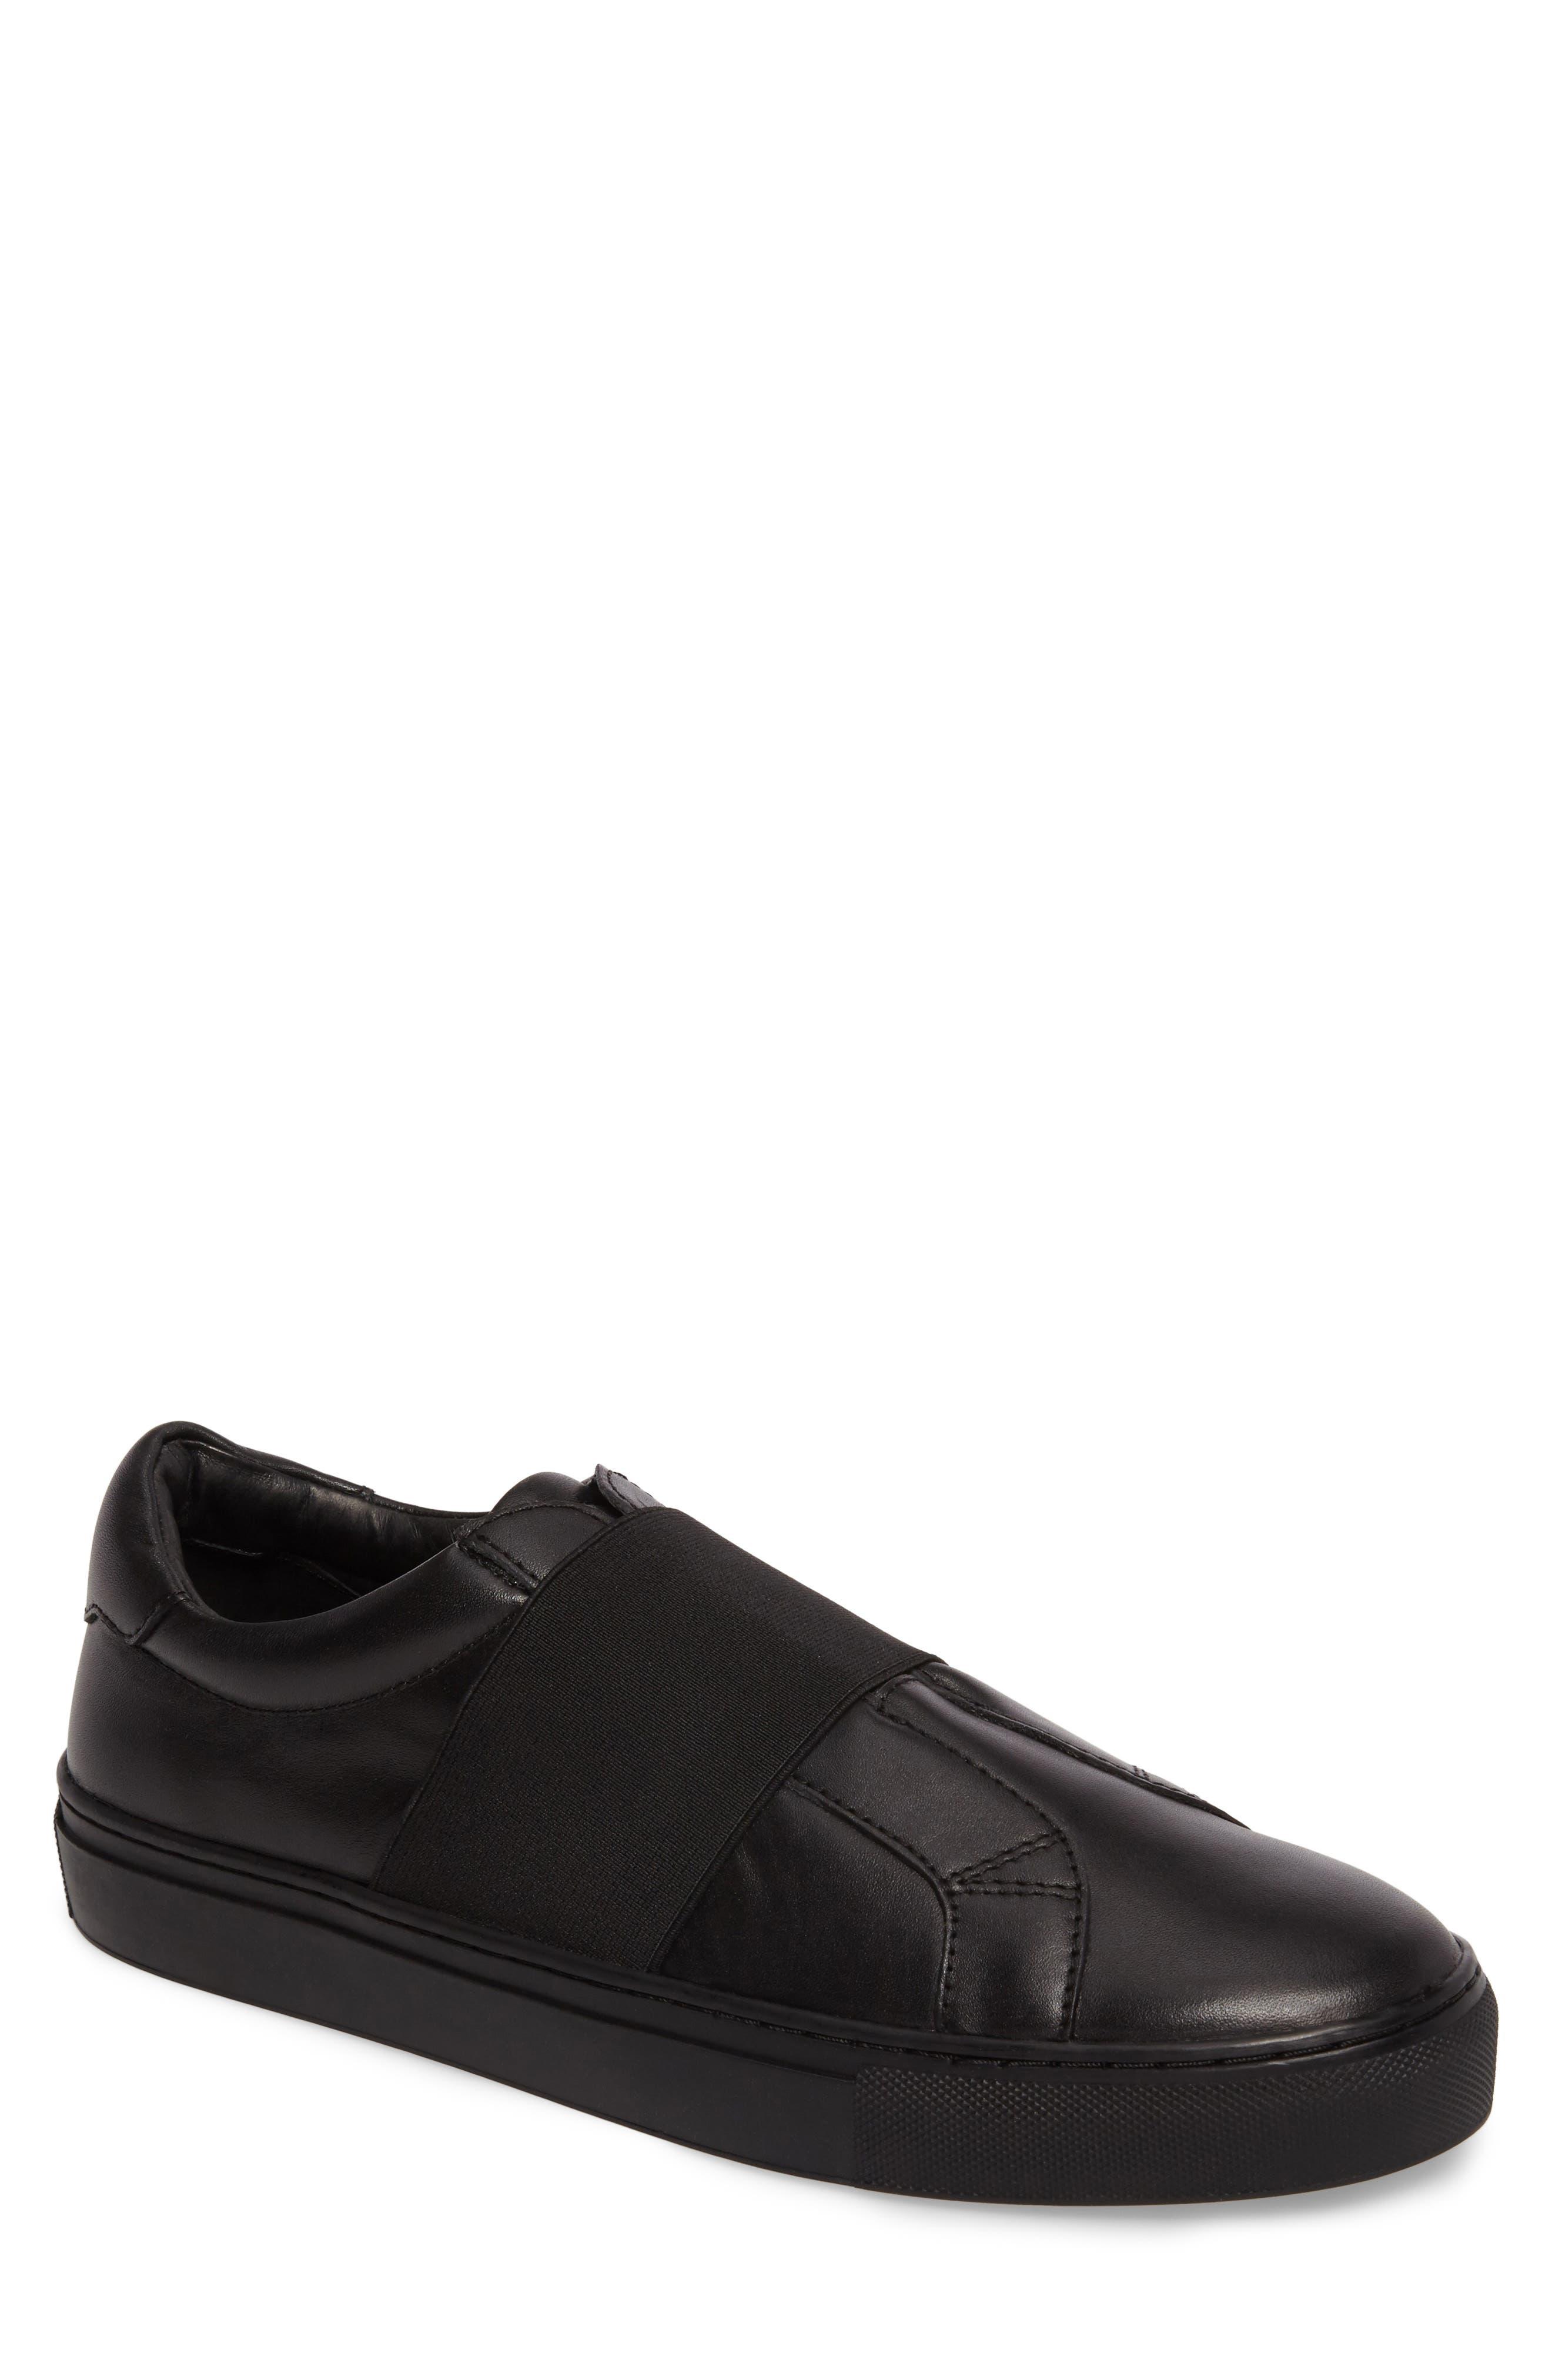 Darel Slip-On,                         Main,                         color, Black Leather